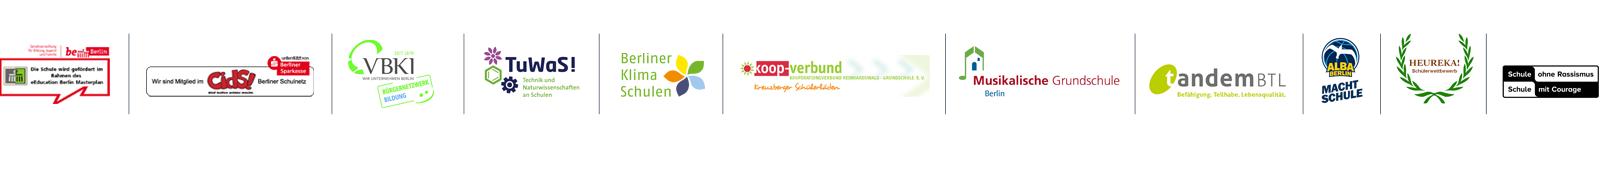 Reinhardswald-Grundschule: KOOPERATIONSPARTNER